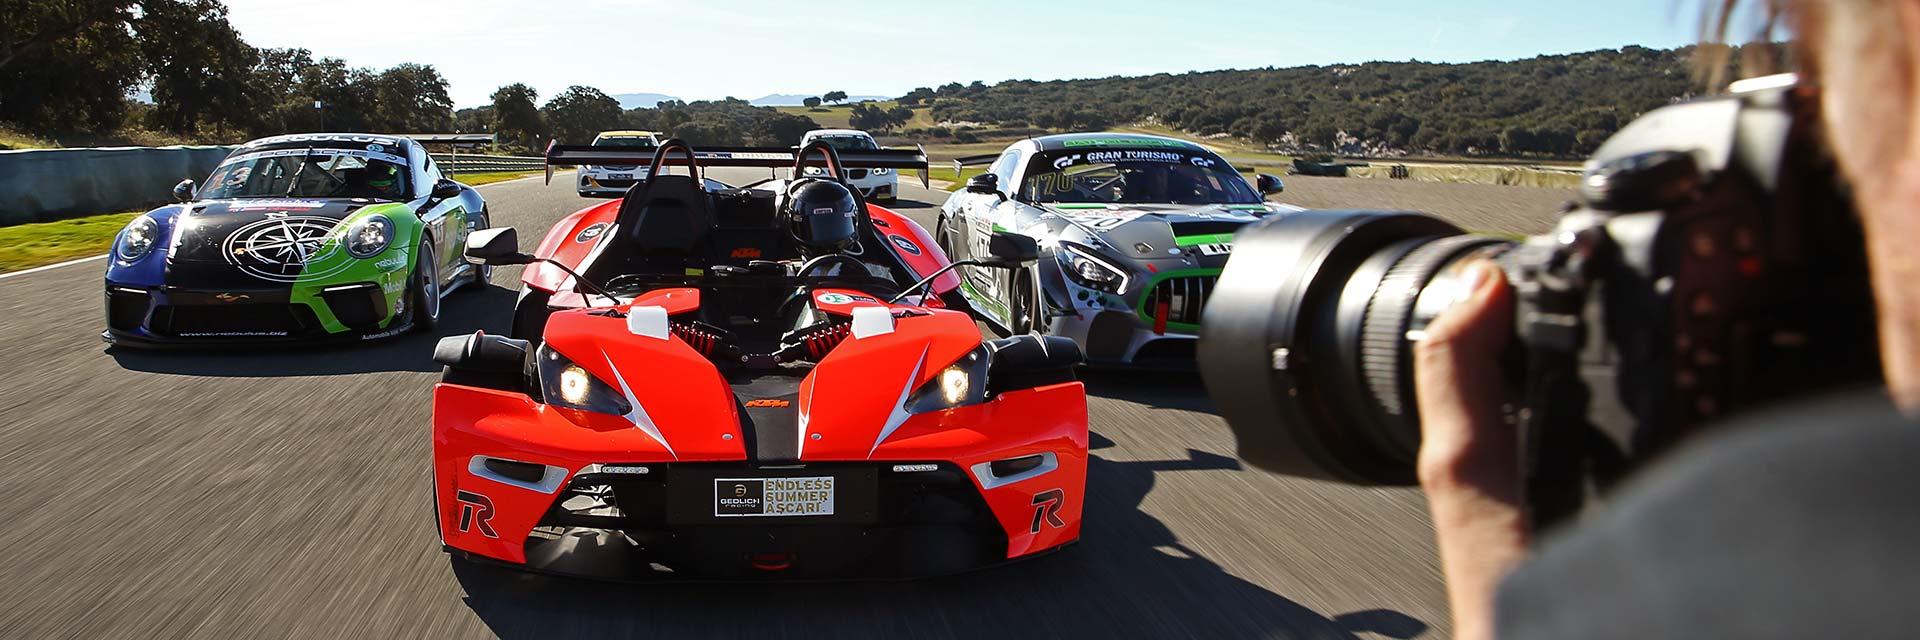 GEDLICH Racing - News